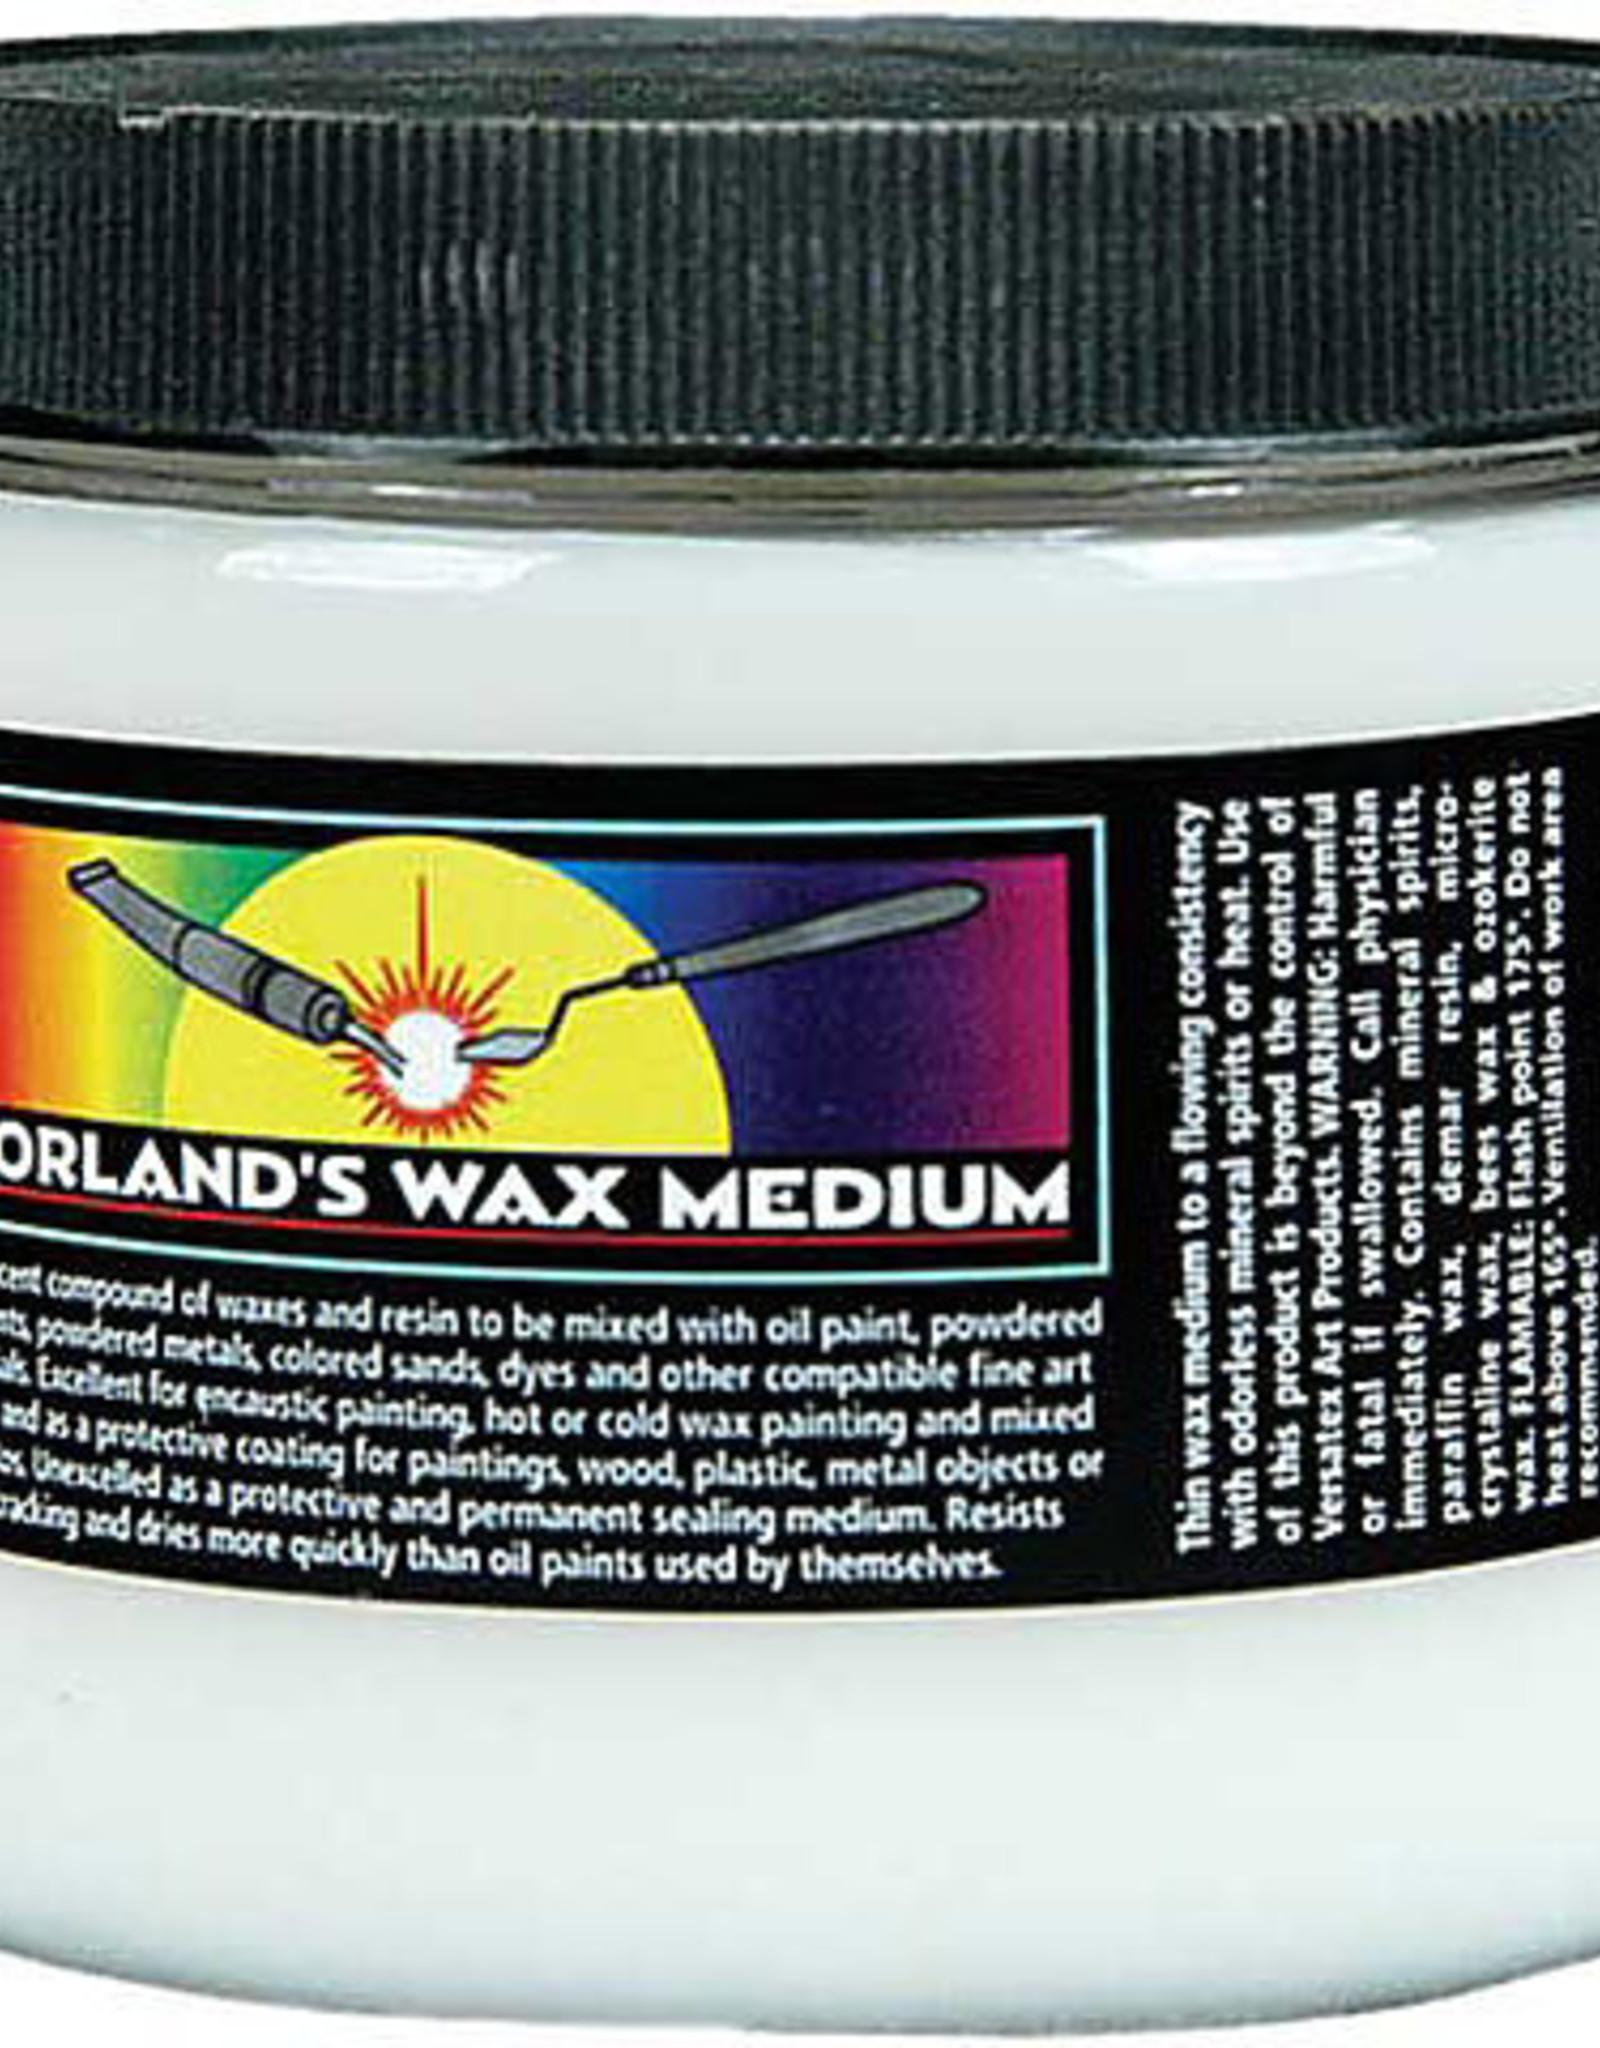 Dorland's Wax Medium